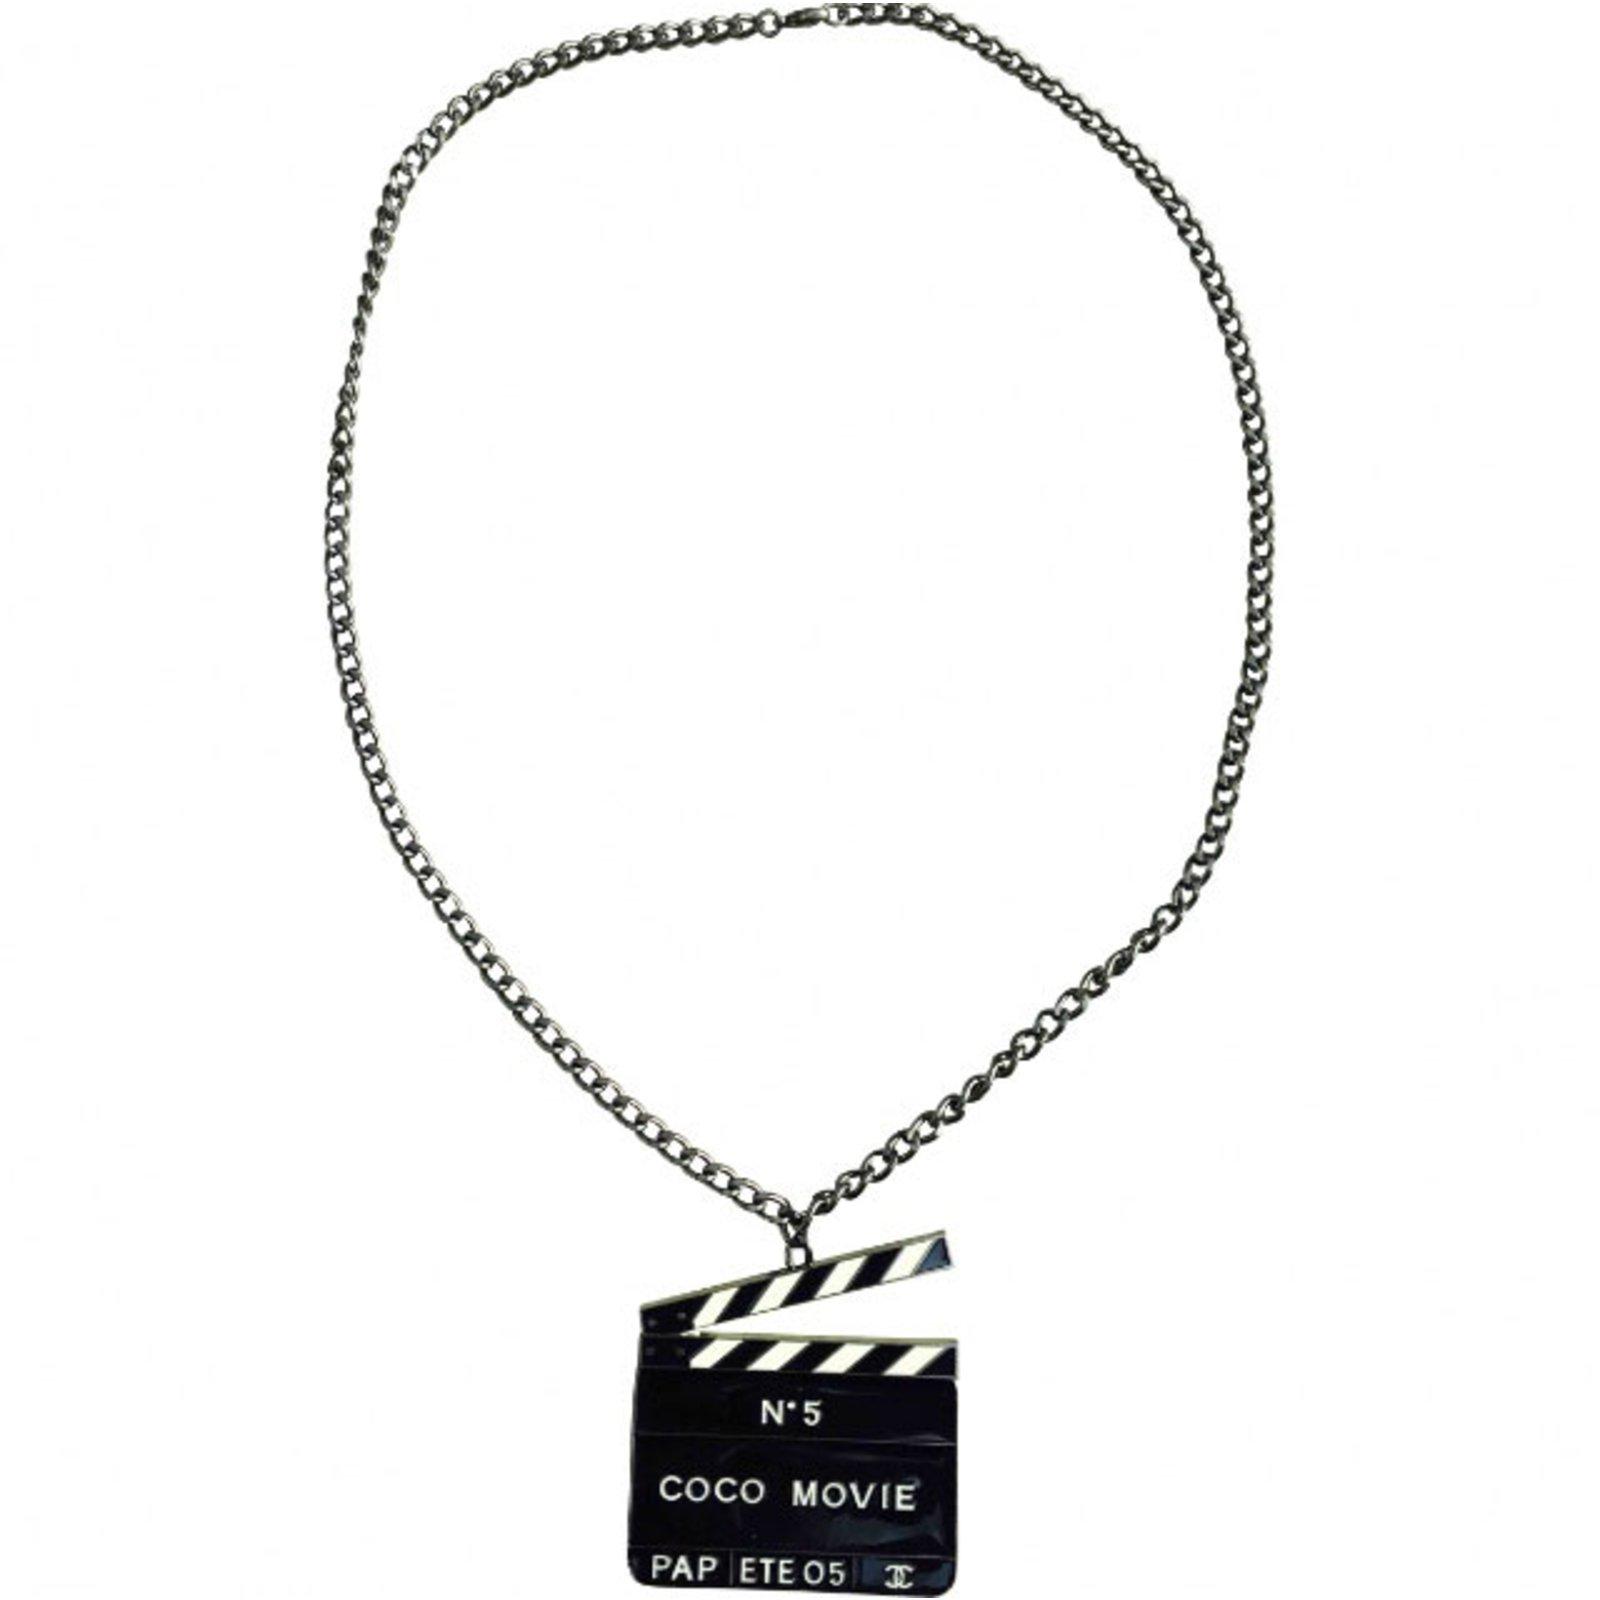 8d25f5fbbb8c62 Chanel necklace Long necklaces Steel Silvery,Grey ref.84027 - Joli ...